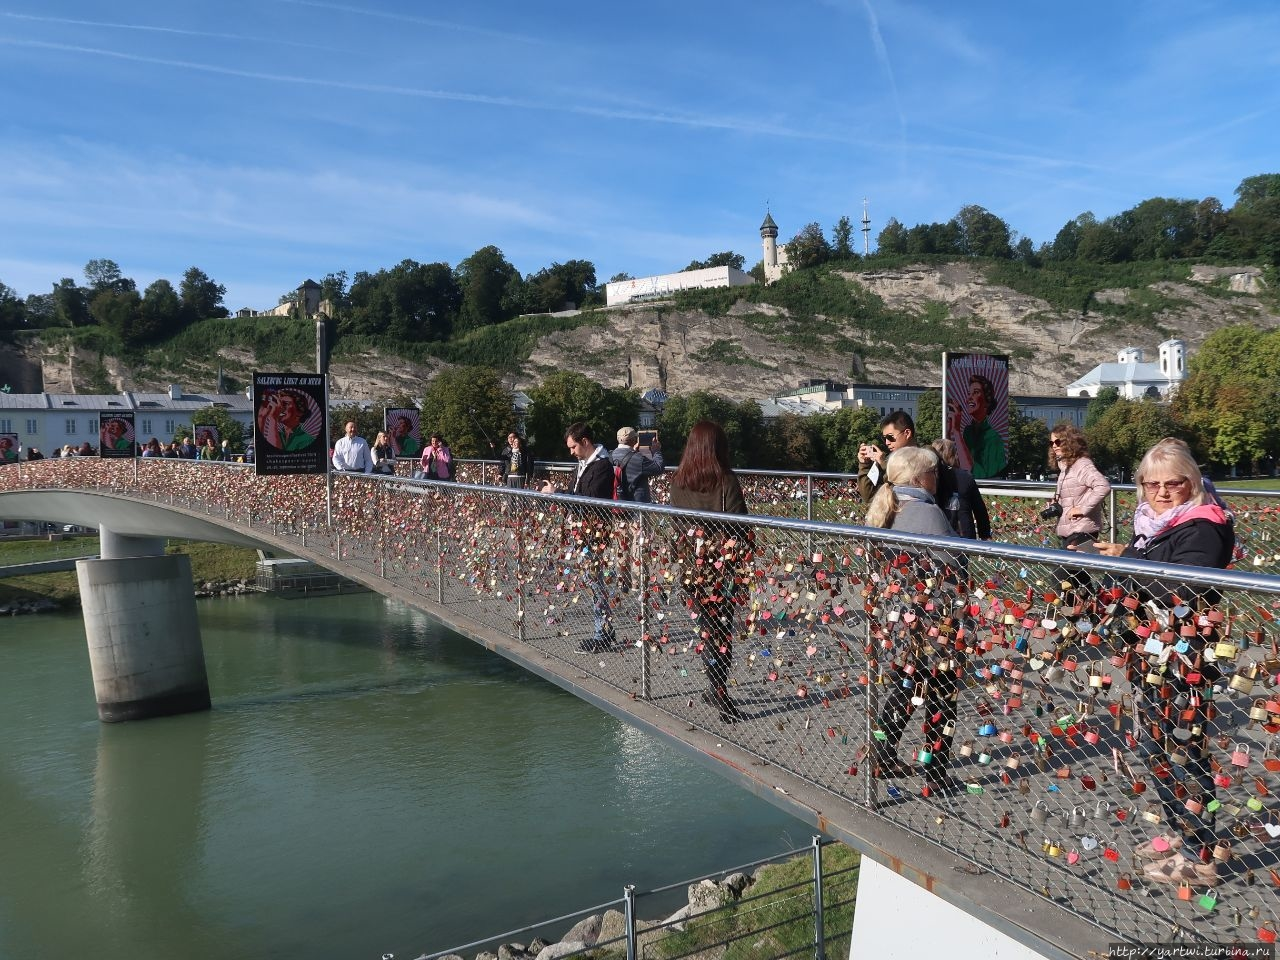 Пешеходный мост Makarsteg